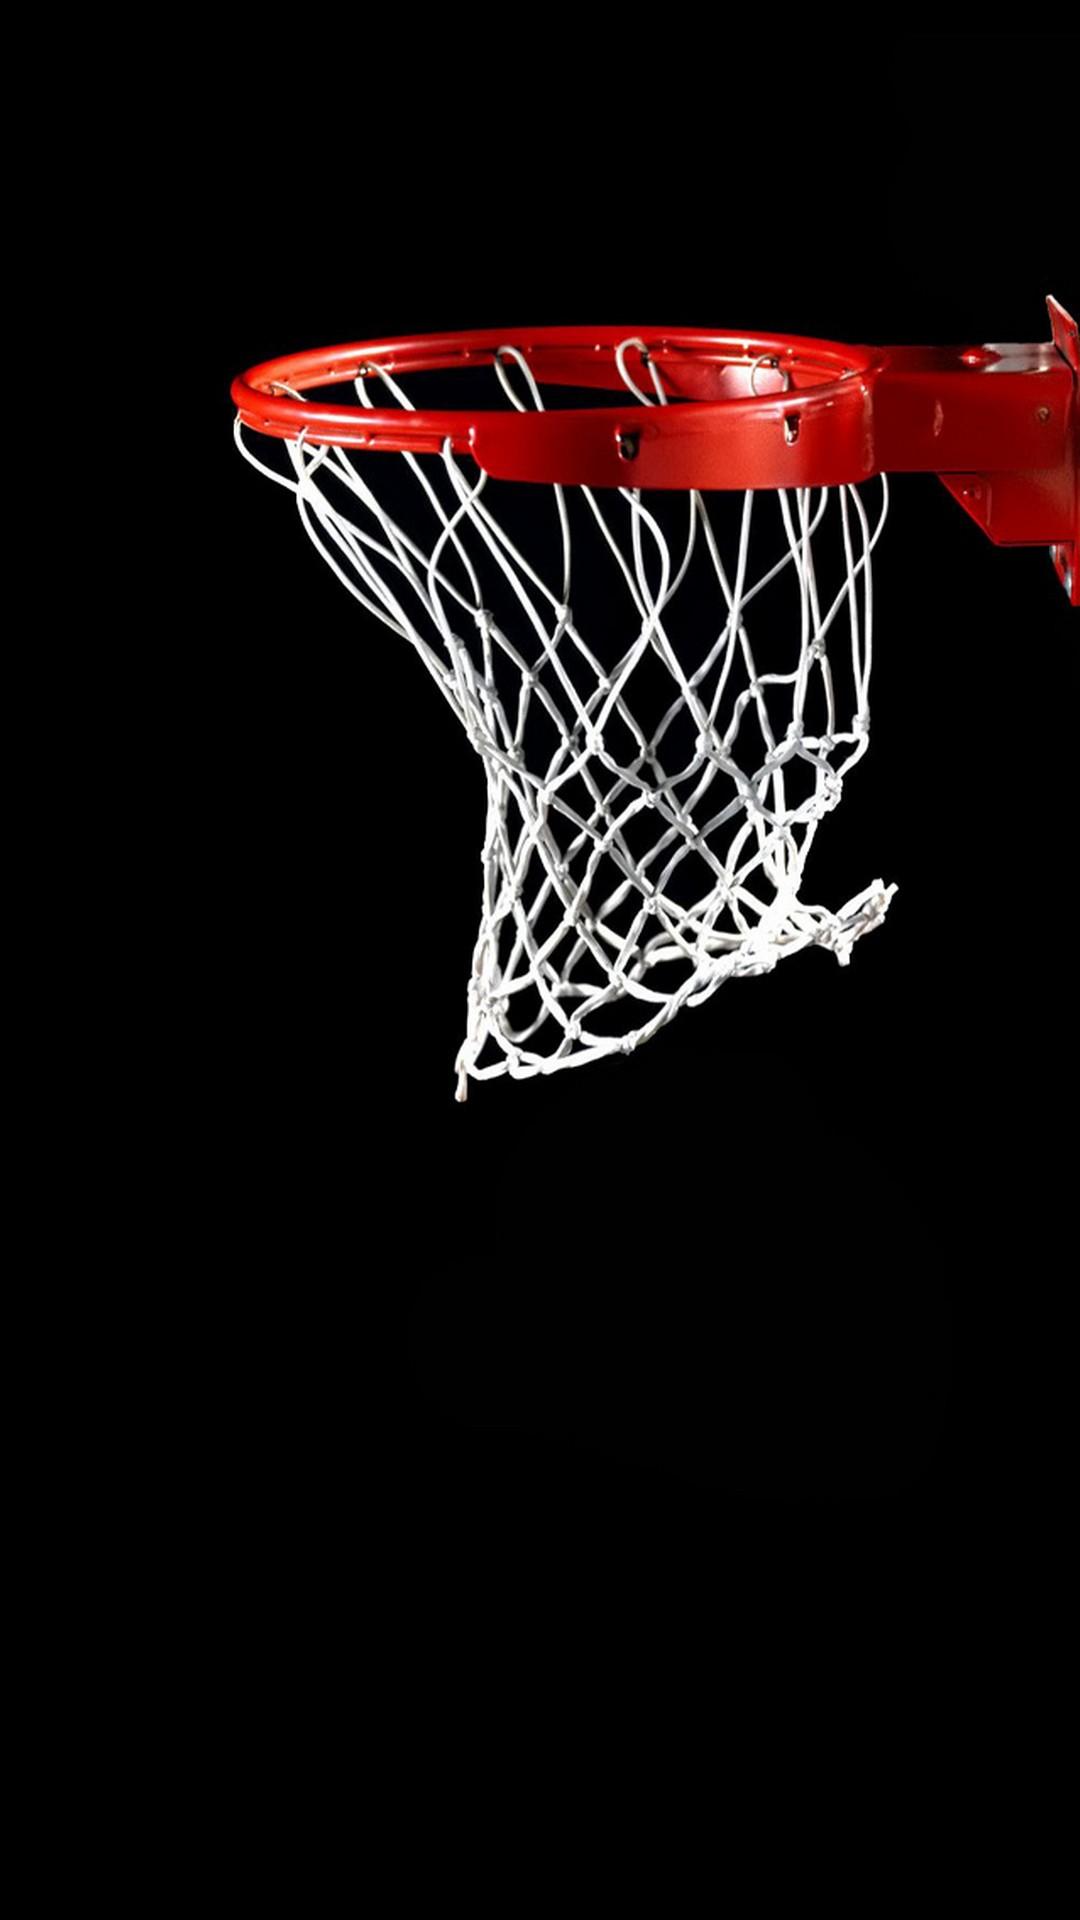 NBA HD Wallpapers For Mobile 2020 Basketball Wallpaper 1080x1920